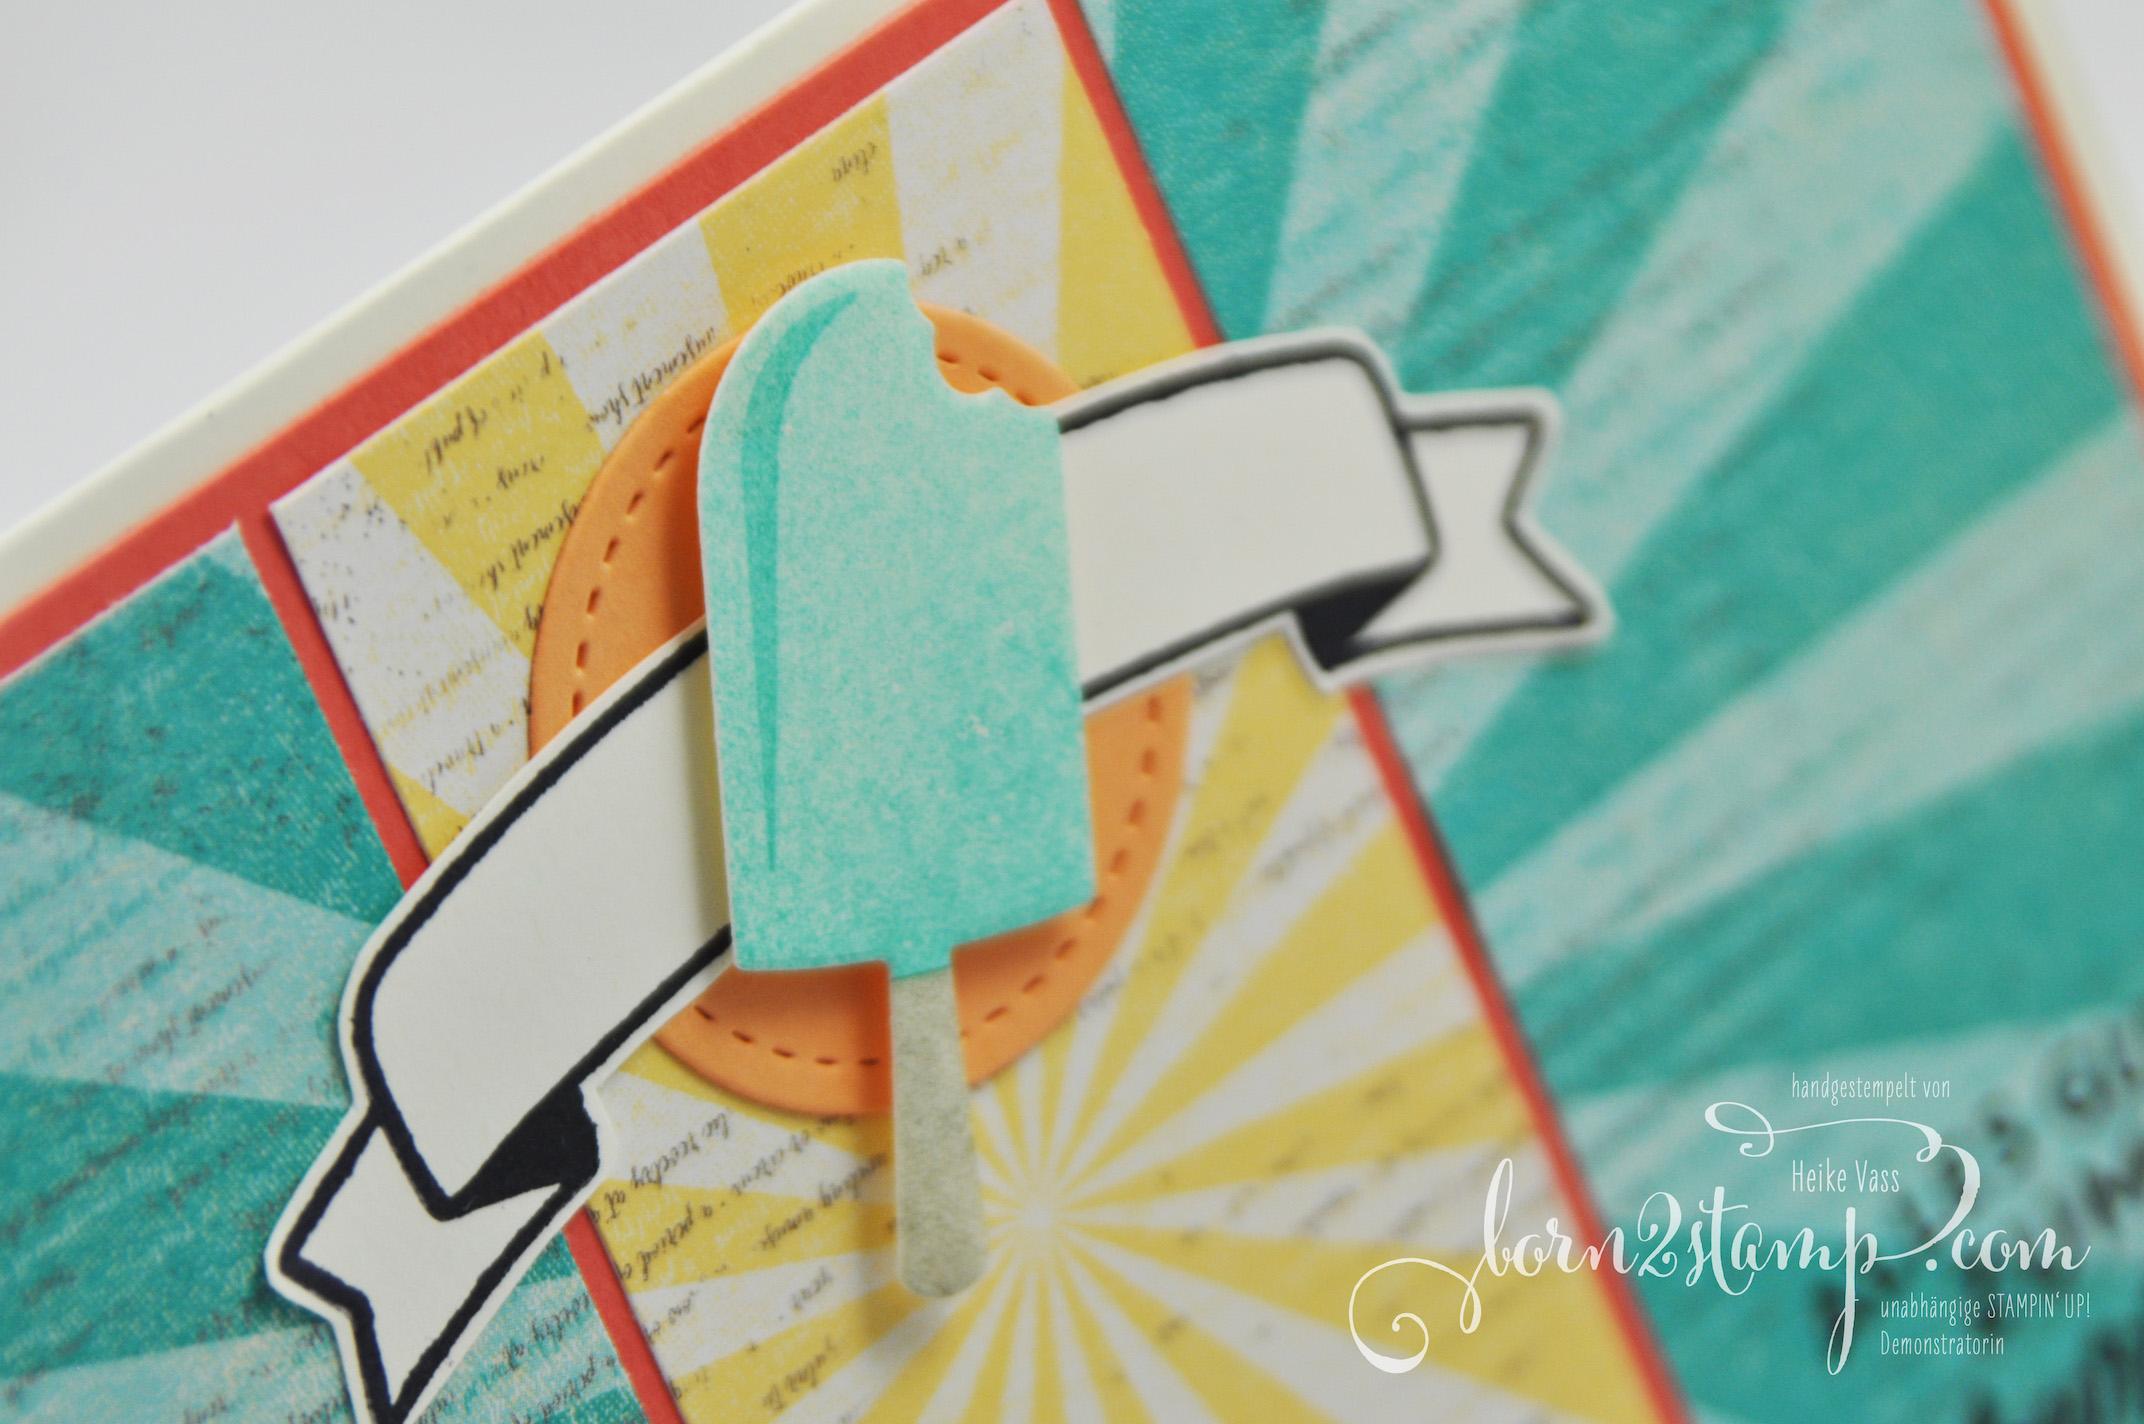 born2stamp STAMPIN' UP! INKSPIRE_me Geburtstagskarte – Eis Eis Baby – DSP Cupcakes und Karussells – Geburtstagshurra